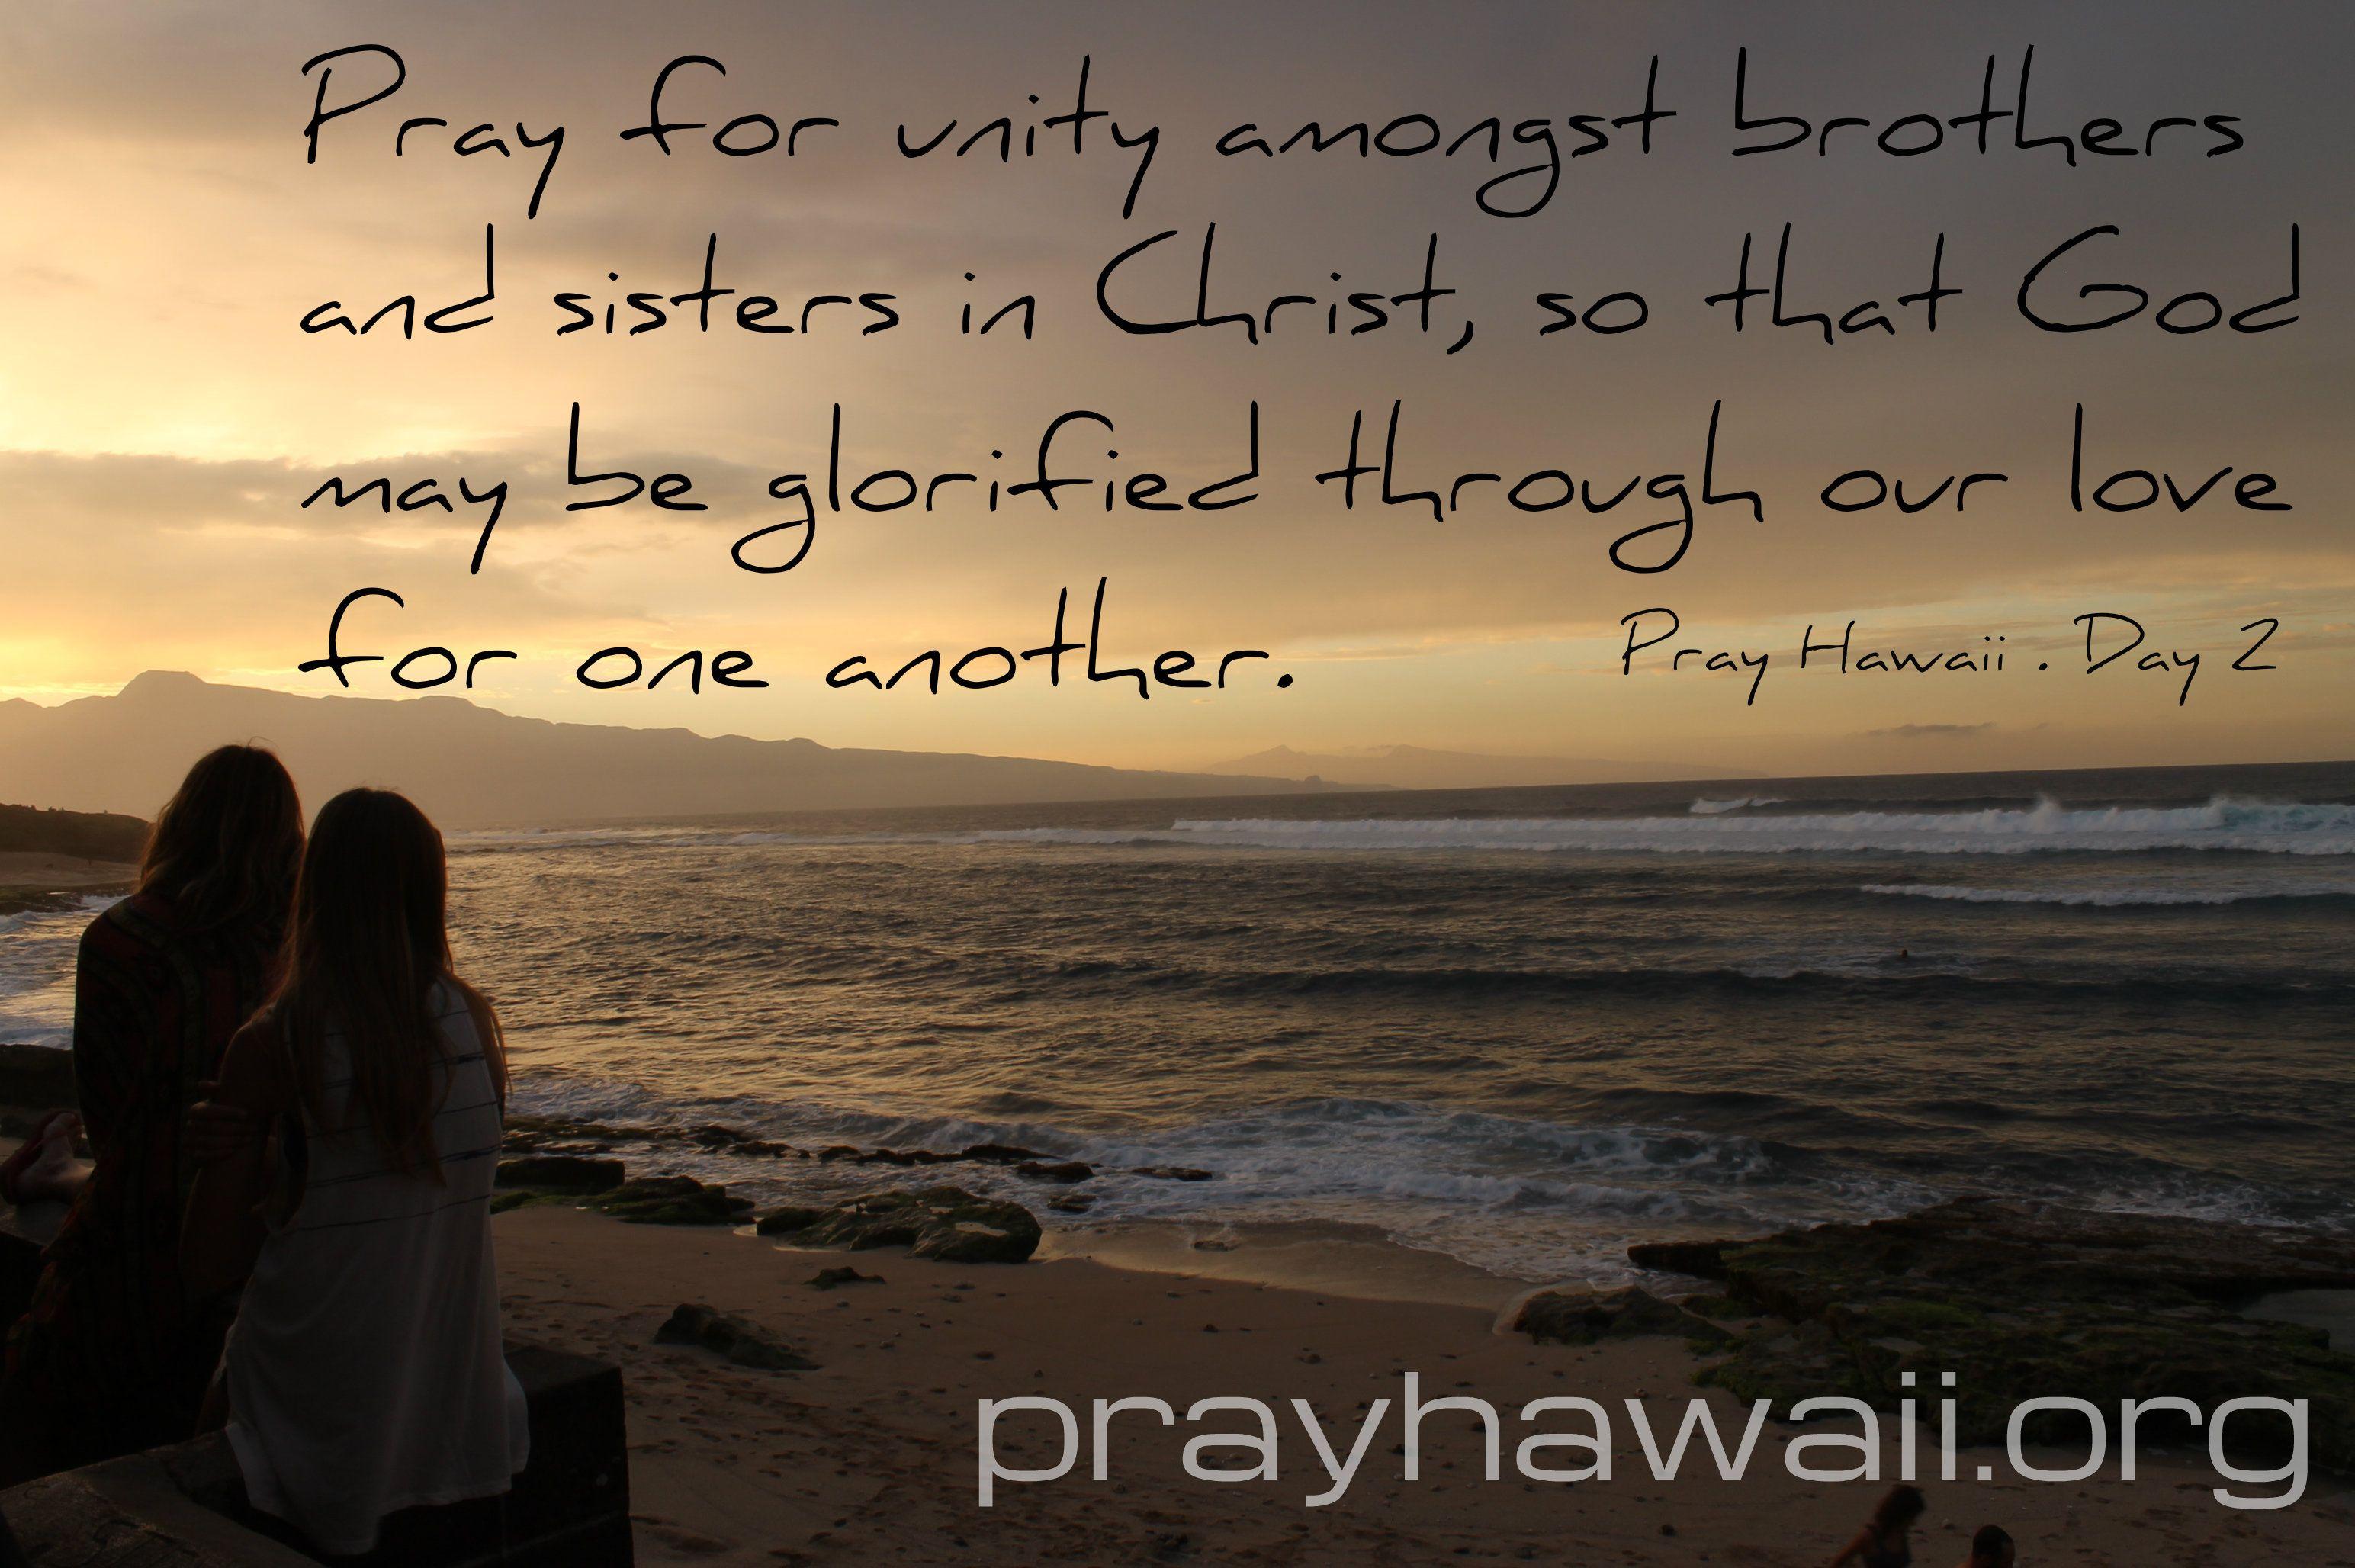 Hawaiian Quotes About Strength: Pray Hawaii – Day 2